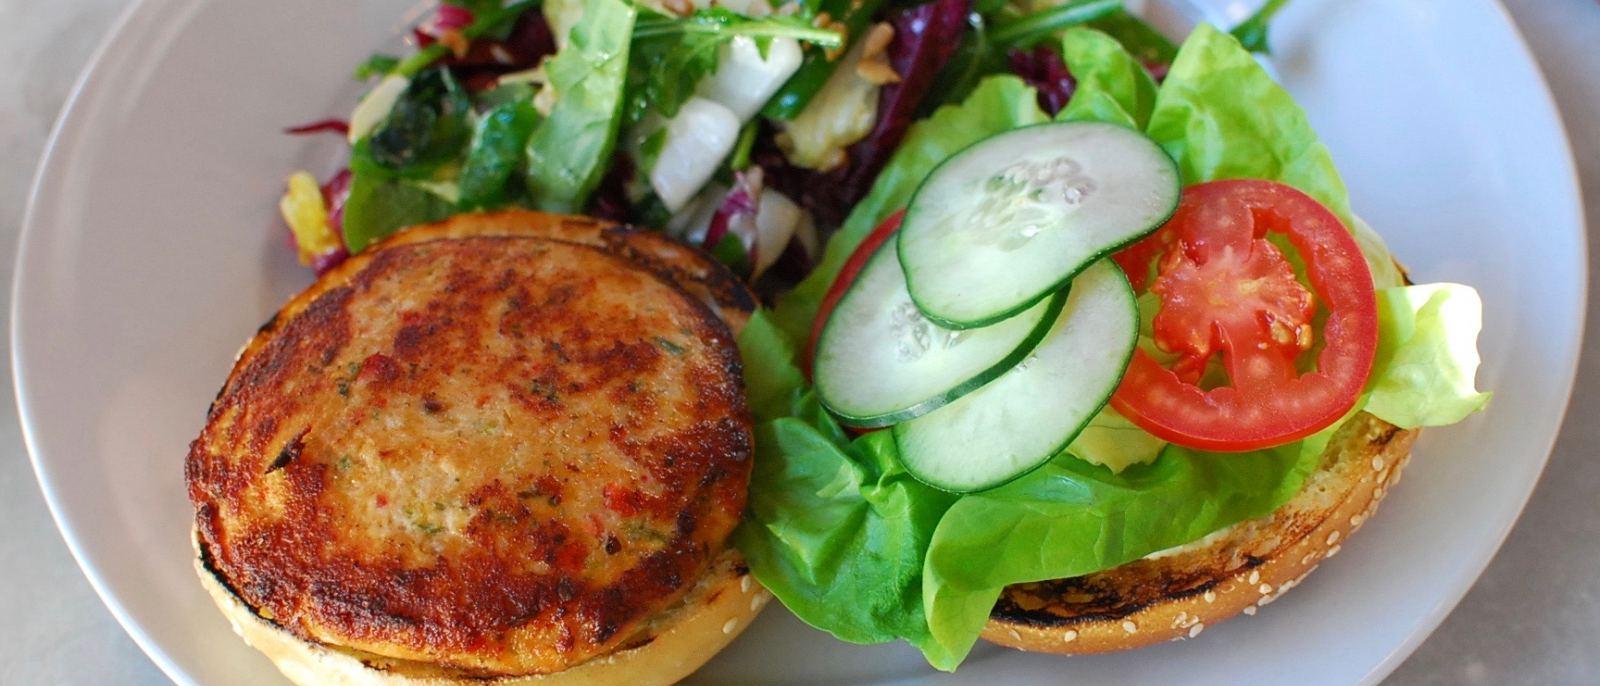 Santa Monica Seafood Spicy Salmon Burger